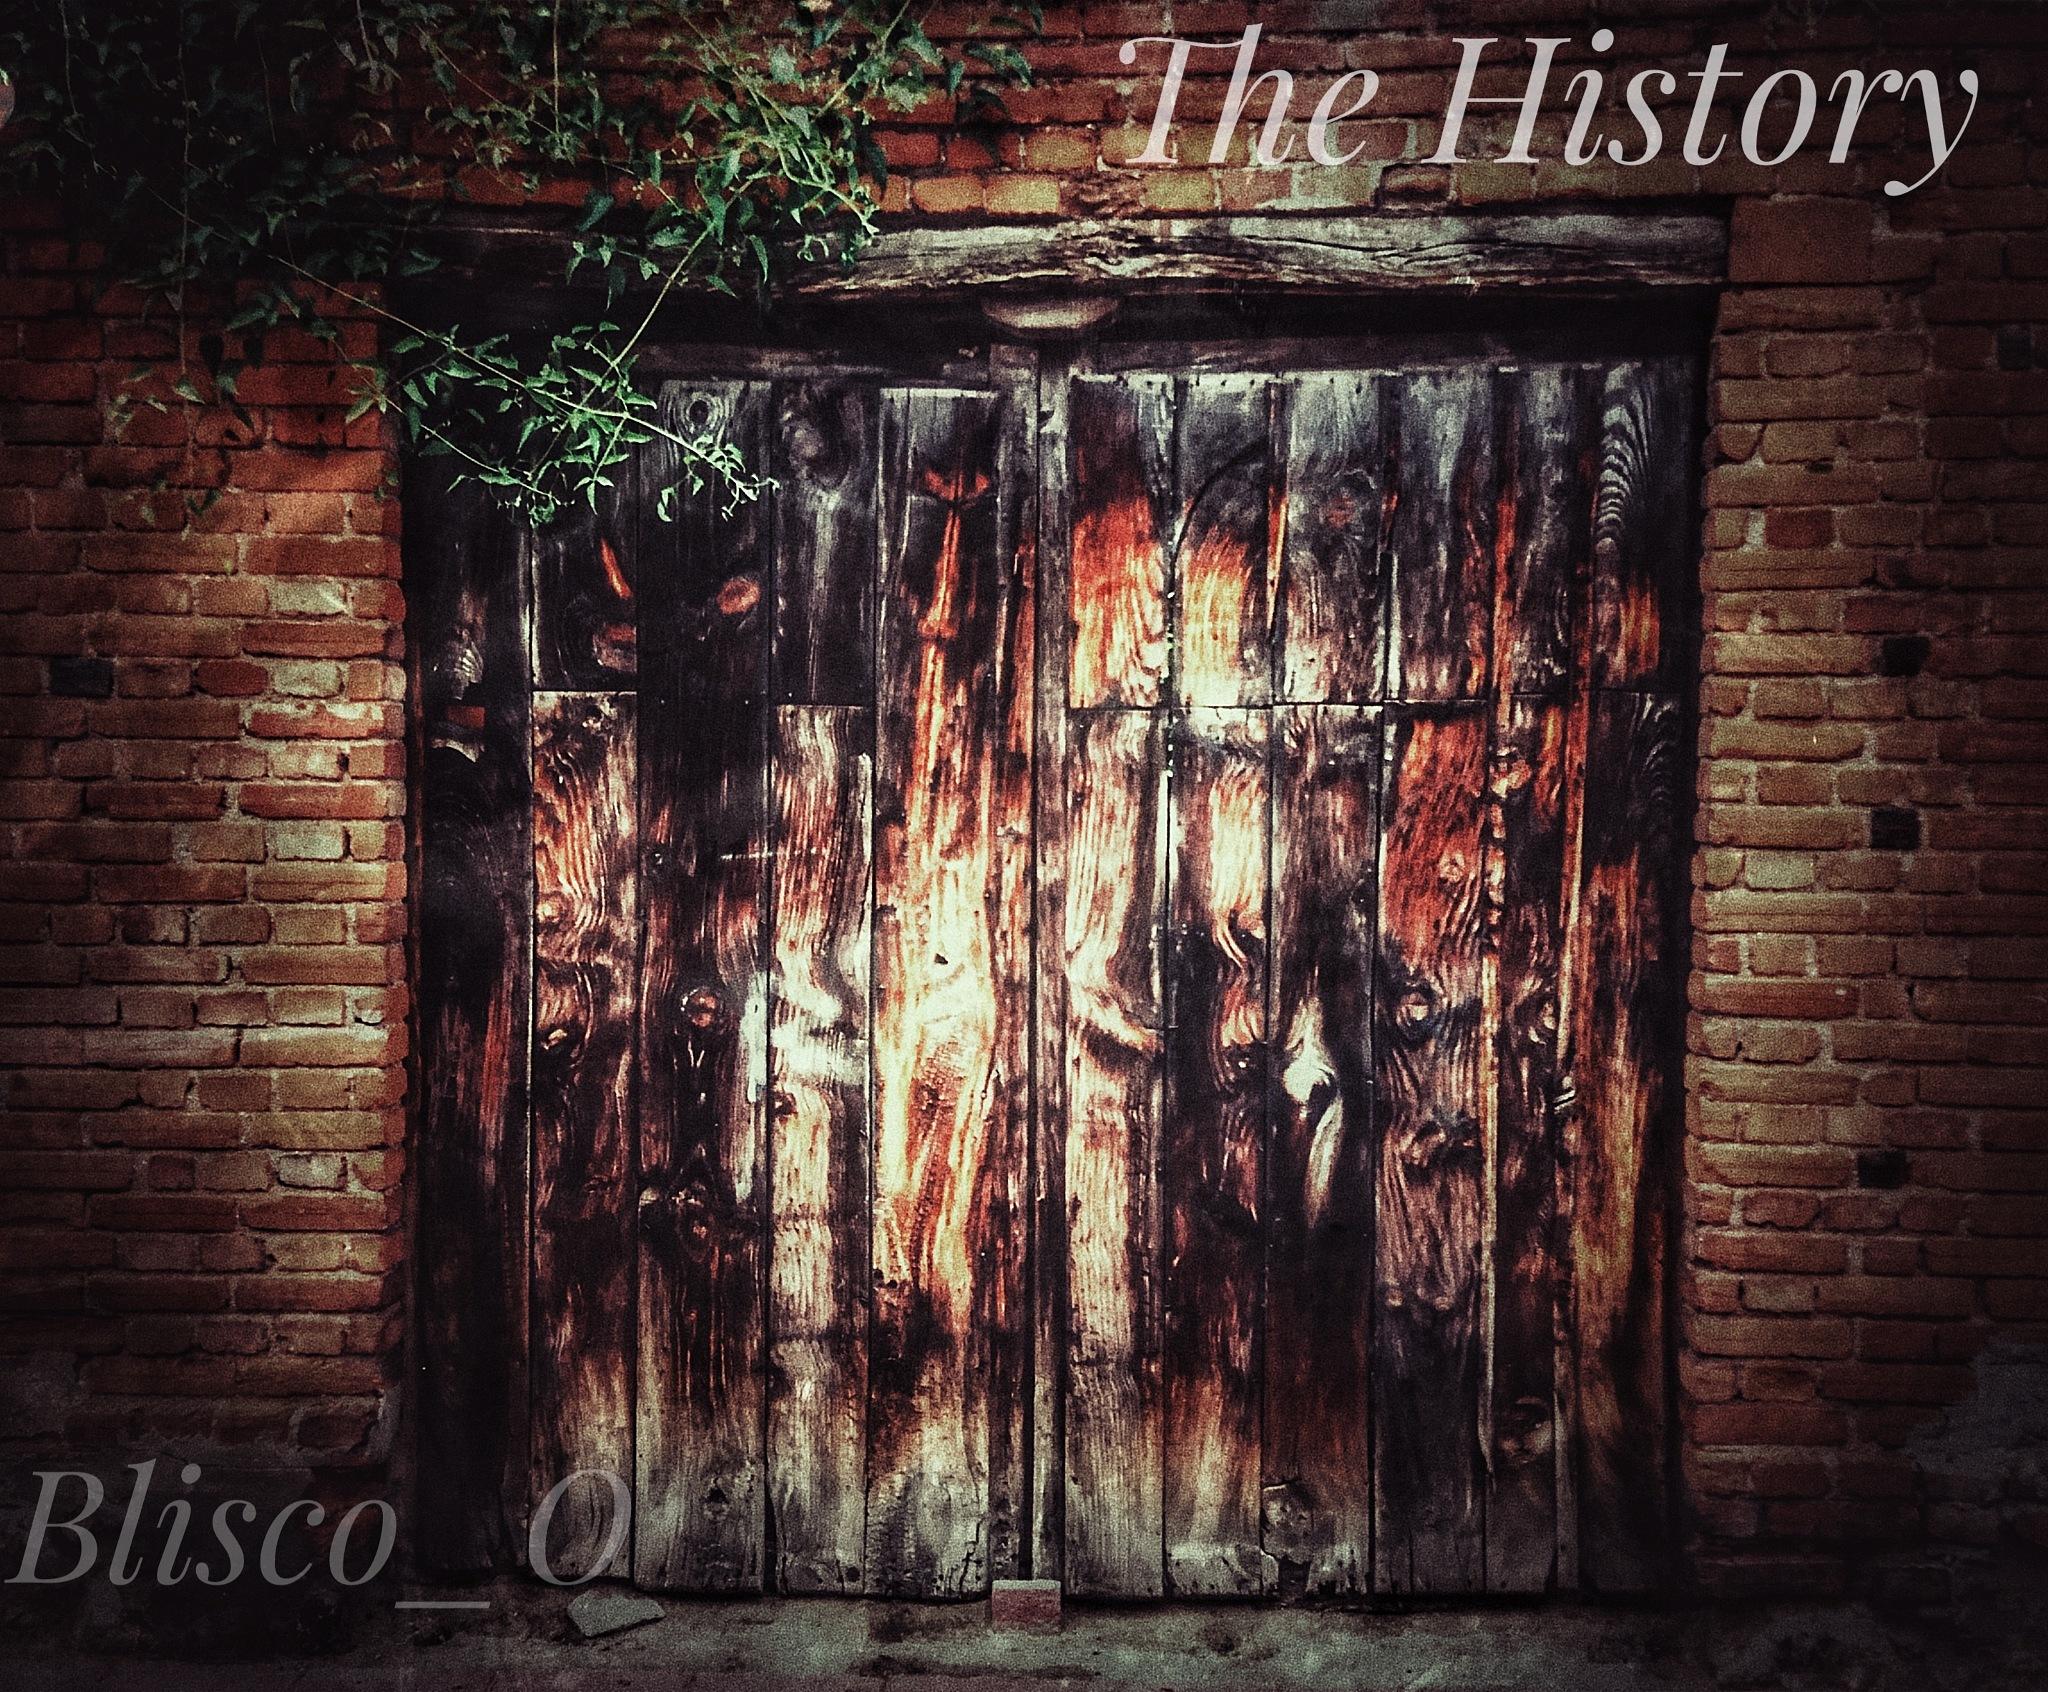 The History by Blisco_O